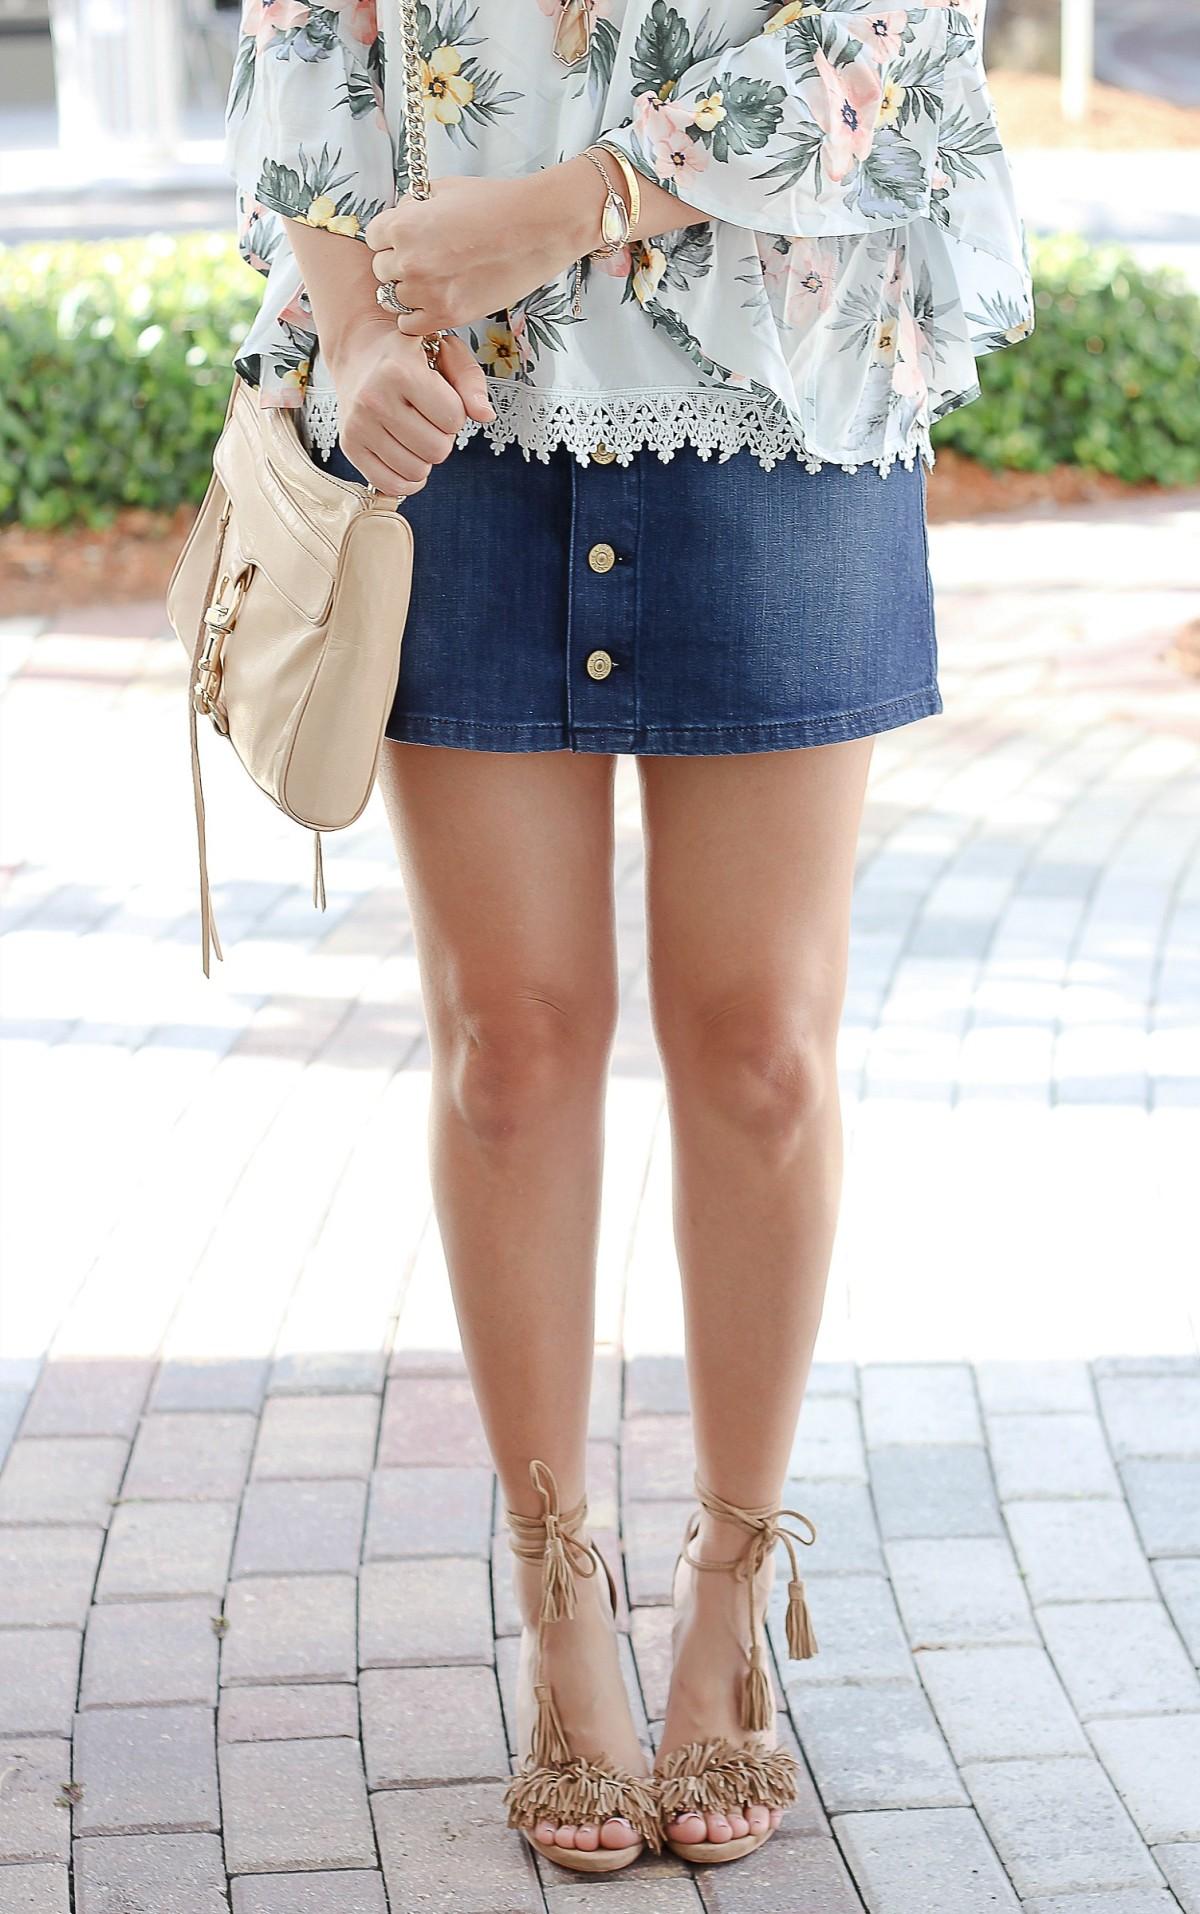 affordable denim skirt, denim skirt trend, lace up heels, tassel heels